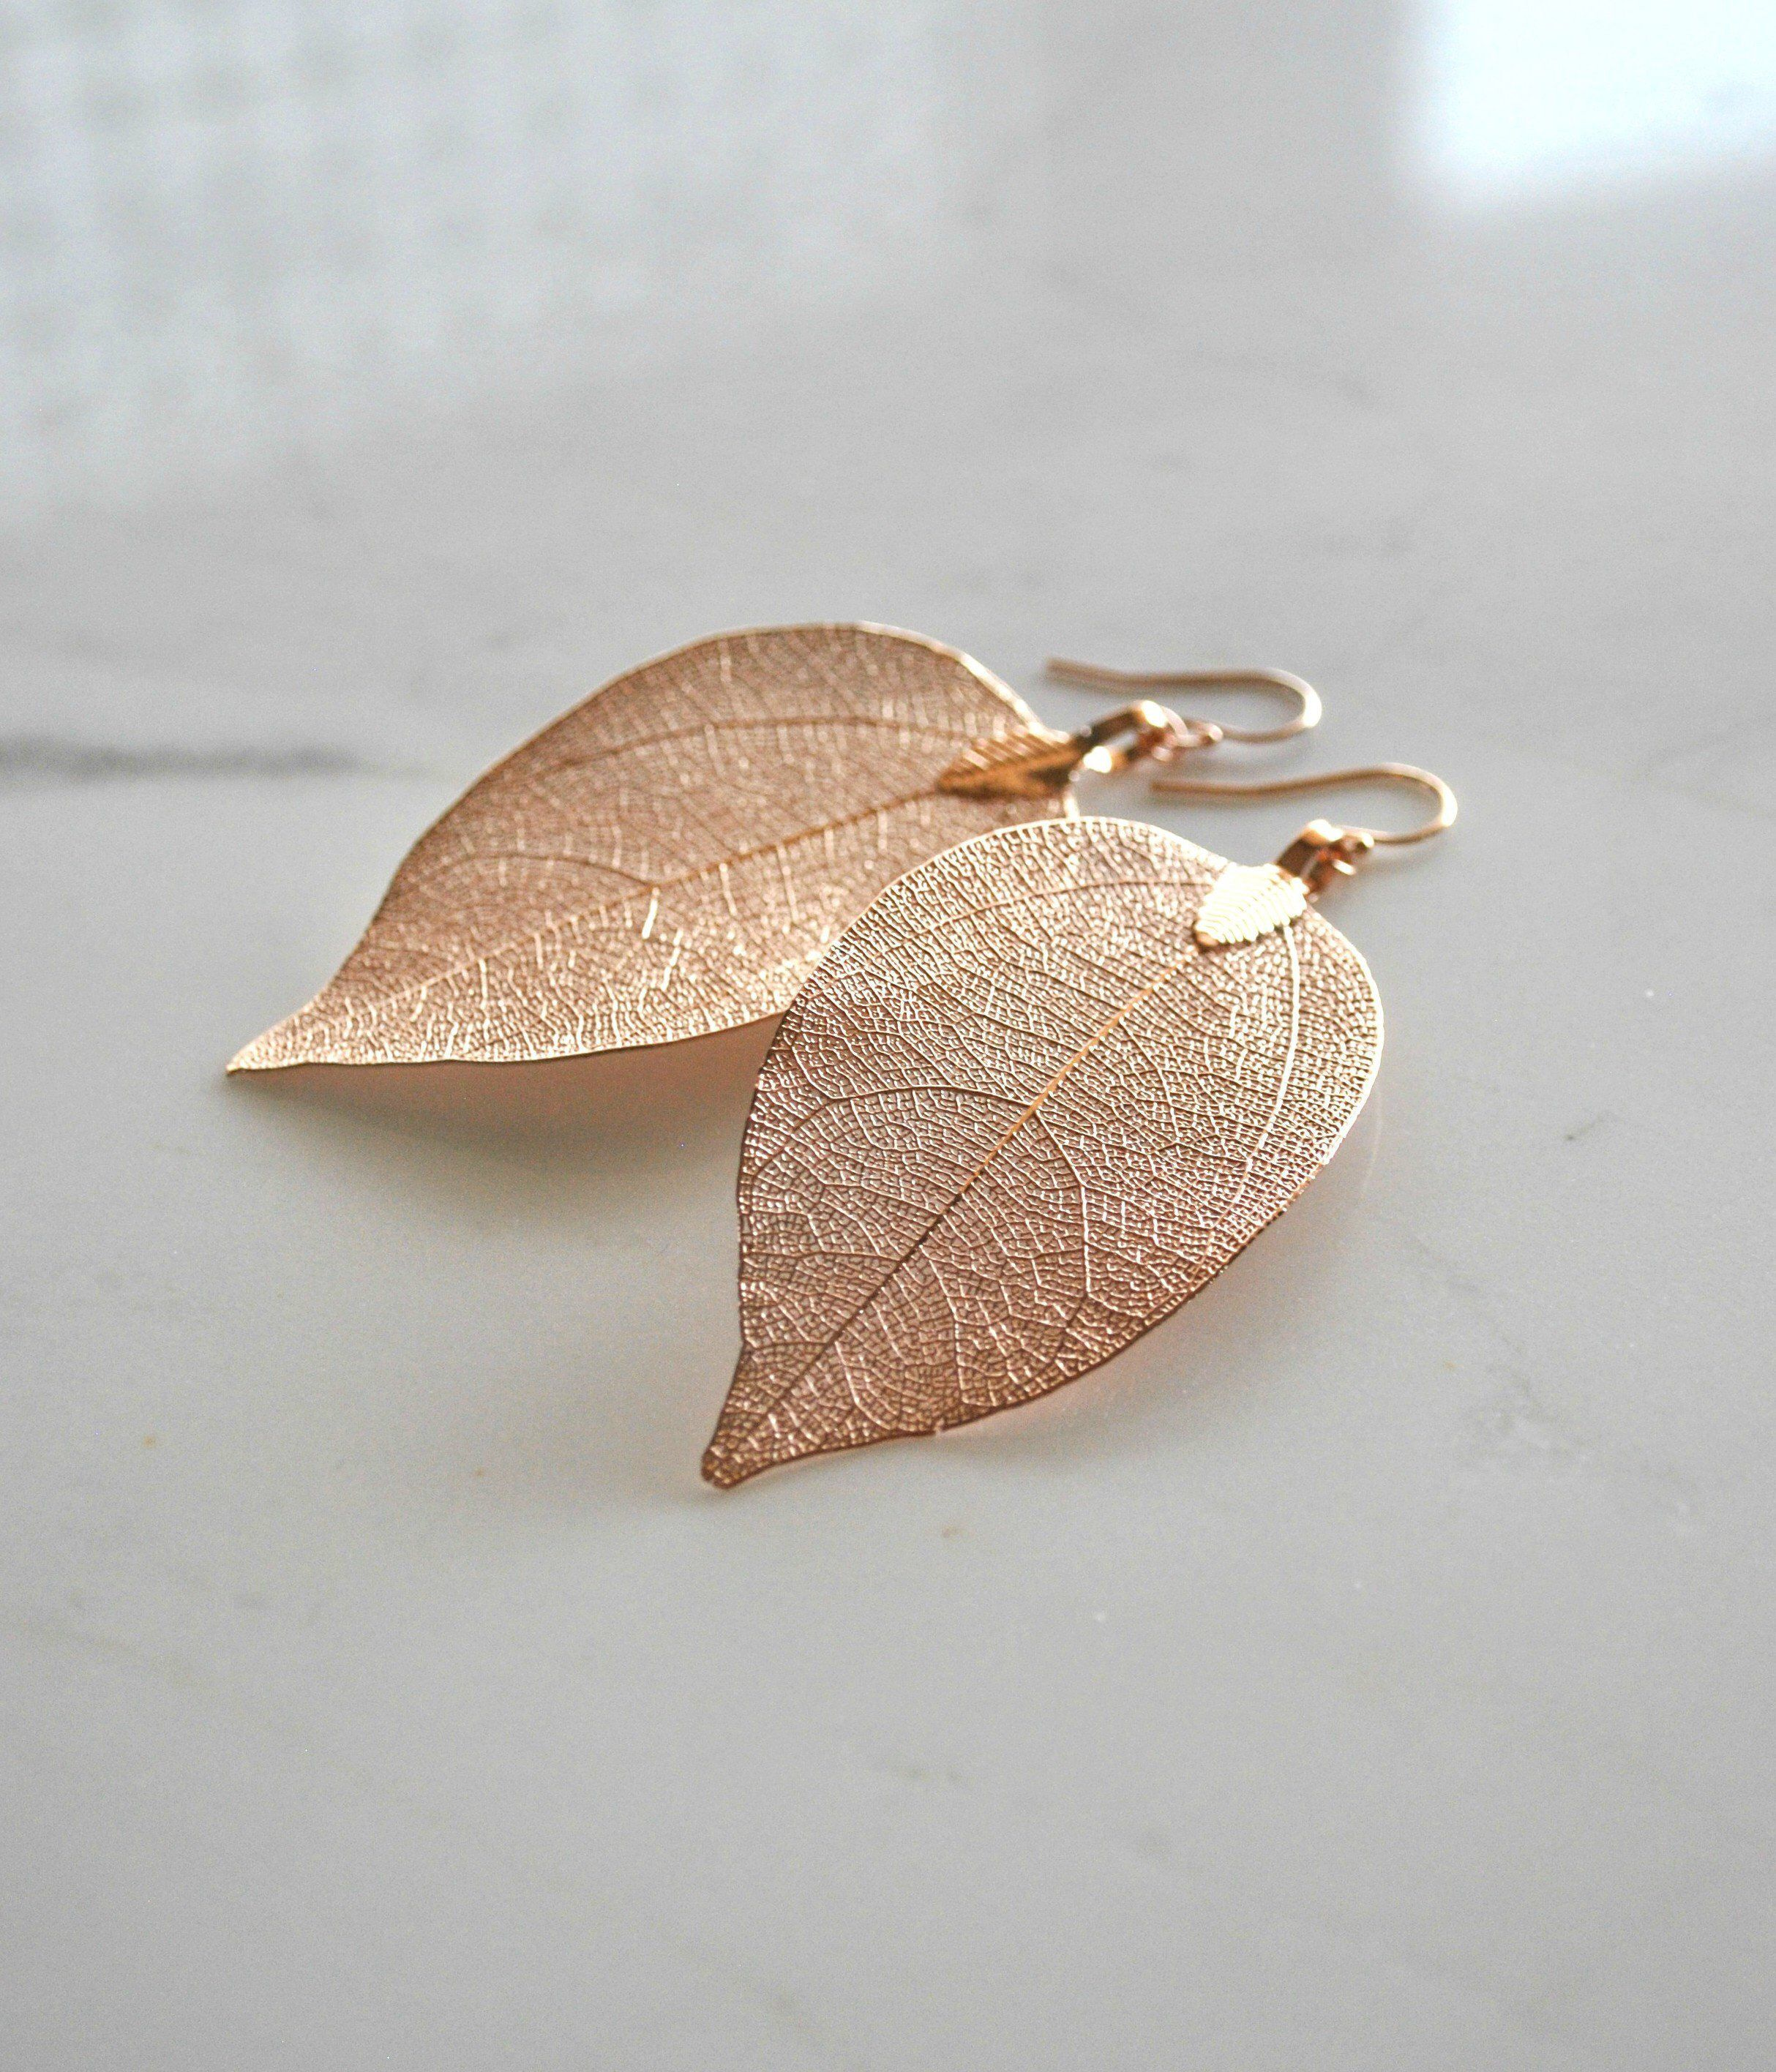 Real Leaf Earrings Rose Gold Leaf Earrings Natural Jewelry Etsy Gold Earrings Dangle Rose Gold Earrings Dangle Nature Jewelry